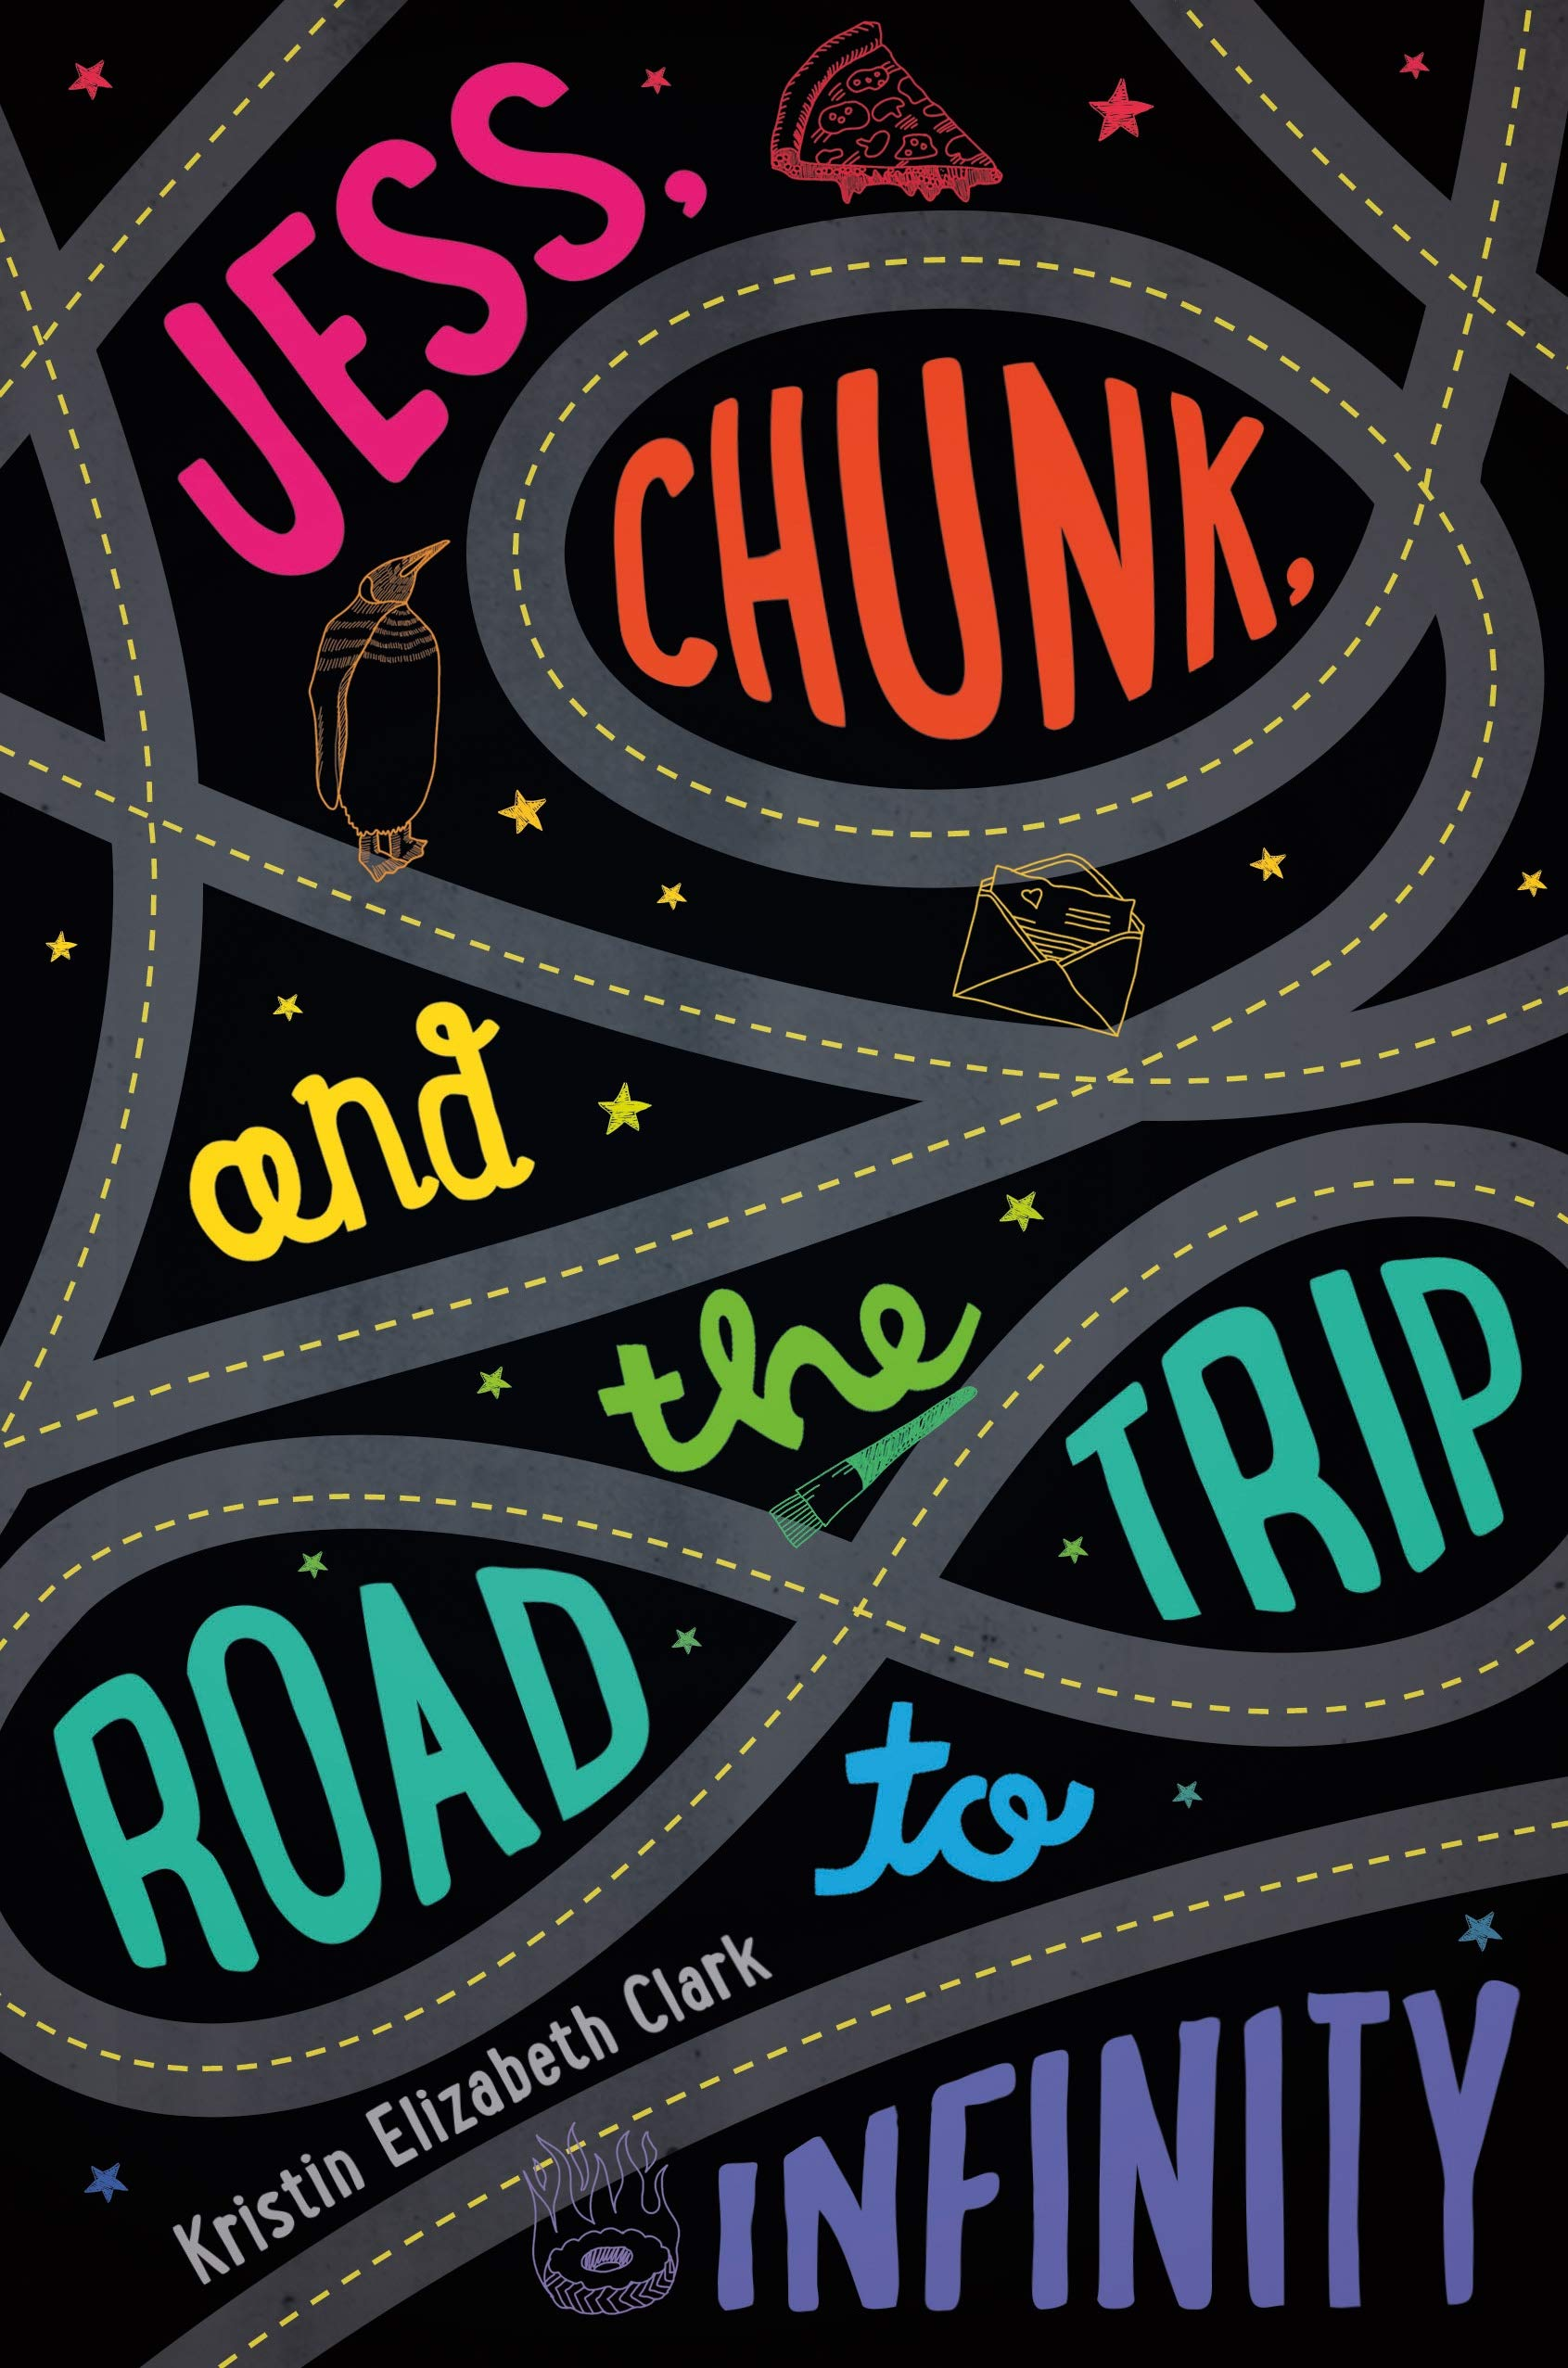 Jess, Chunk, and the Road Trip to Infinity: Clark, Kristin Elizabeth:  9780374380069: Amazon.com: Books